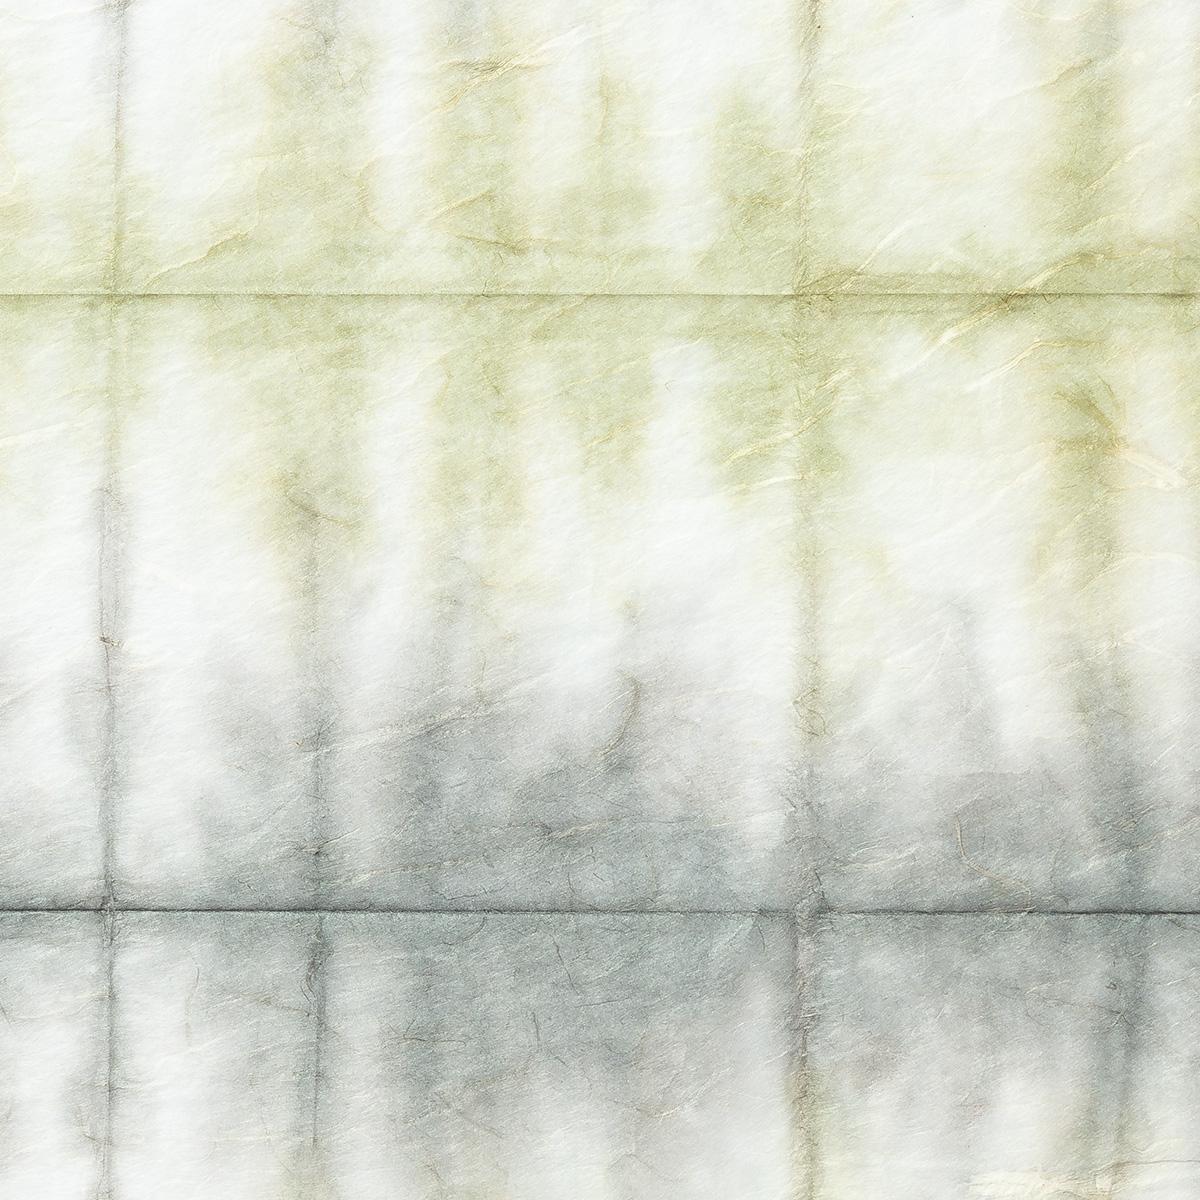 楮6匁 雲竜紙 板締め No.14